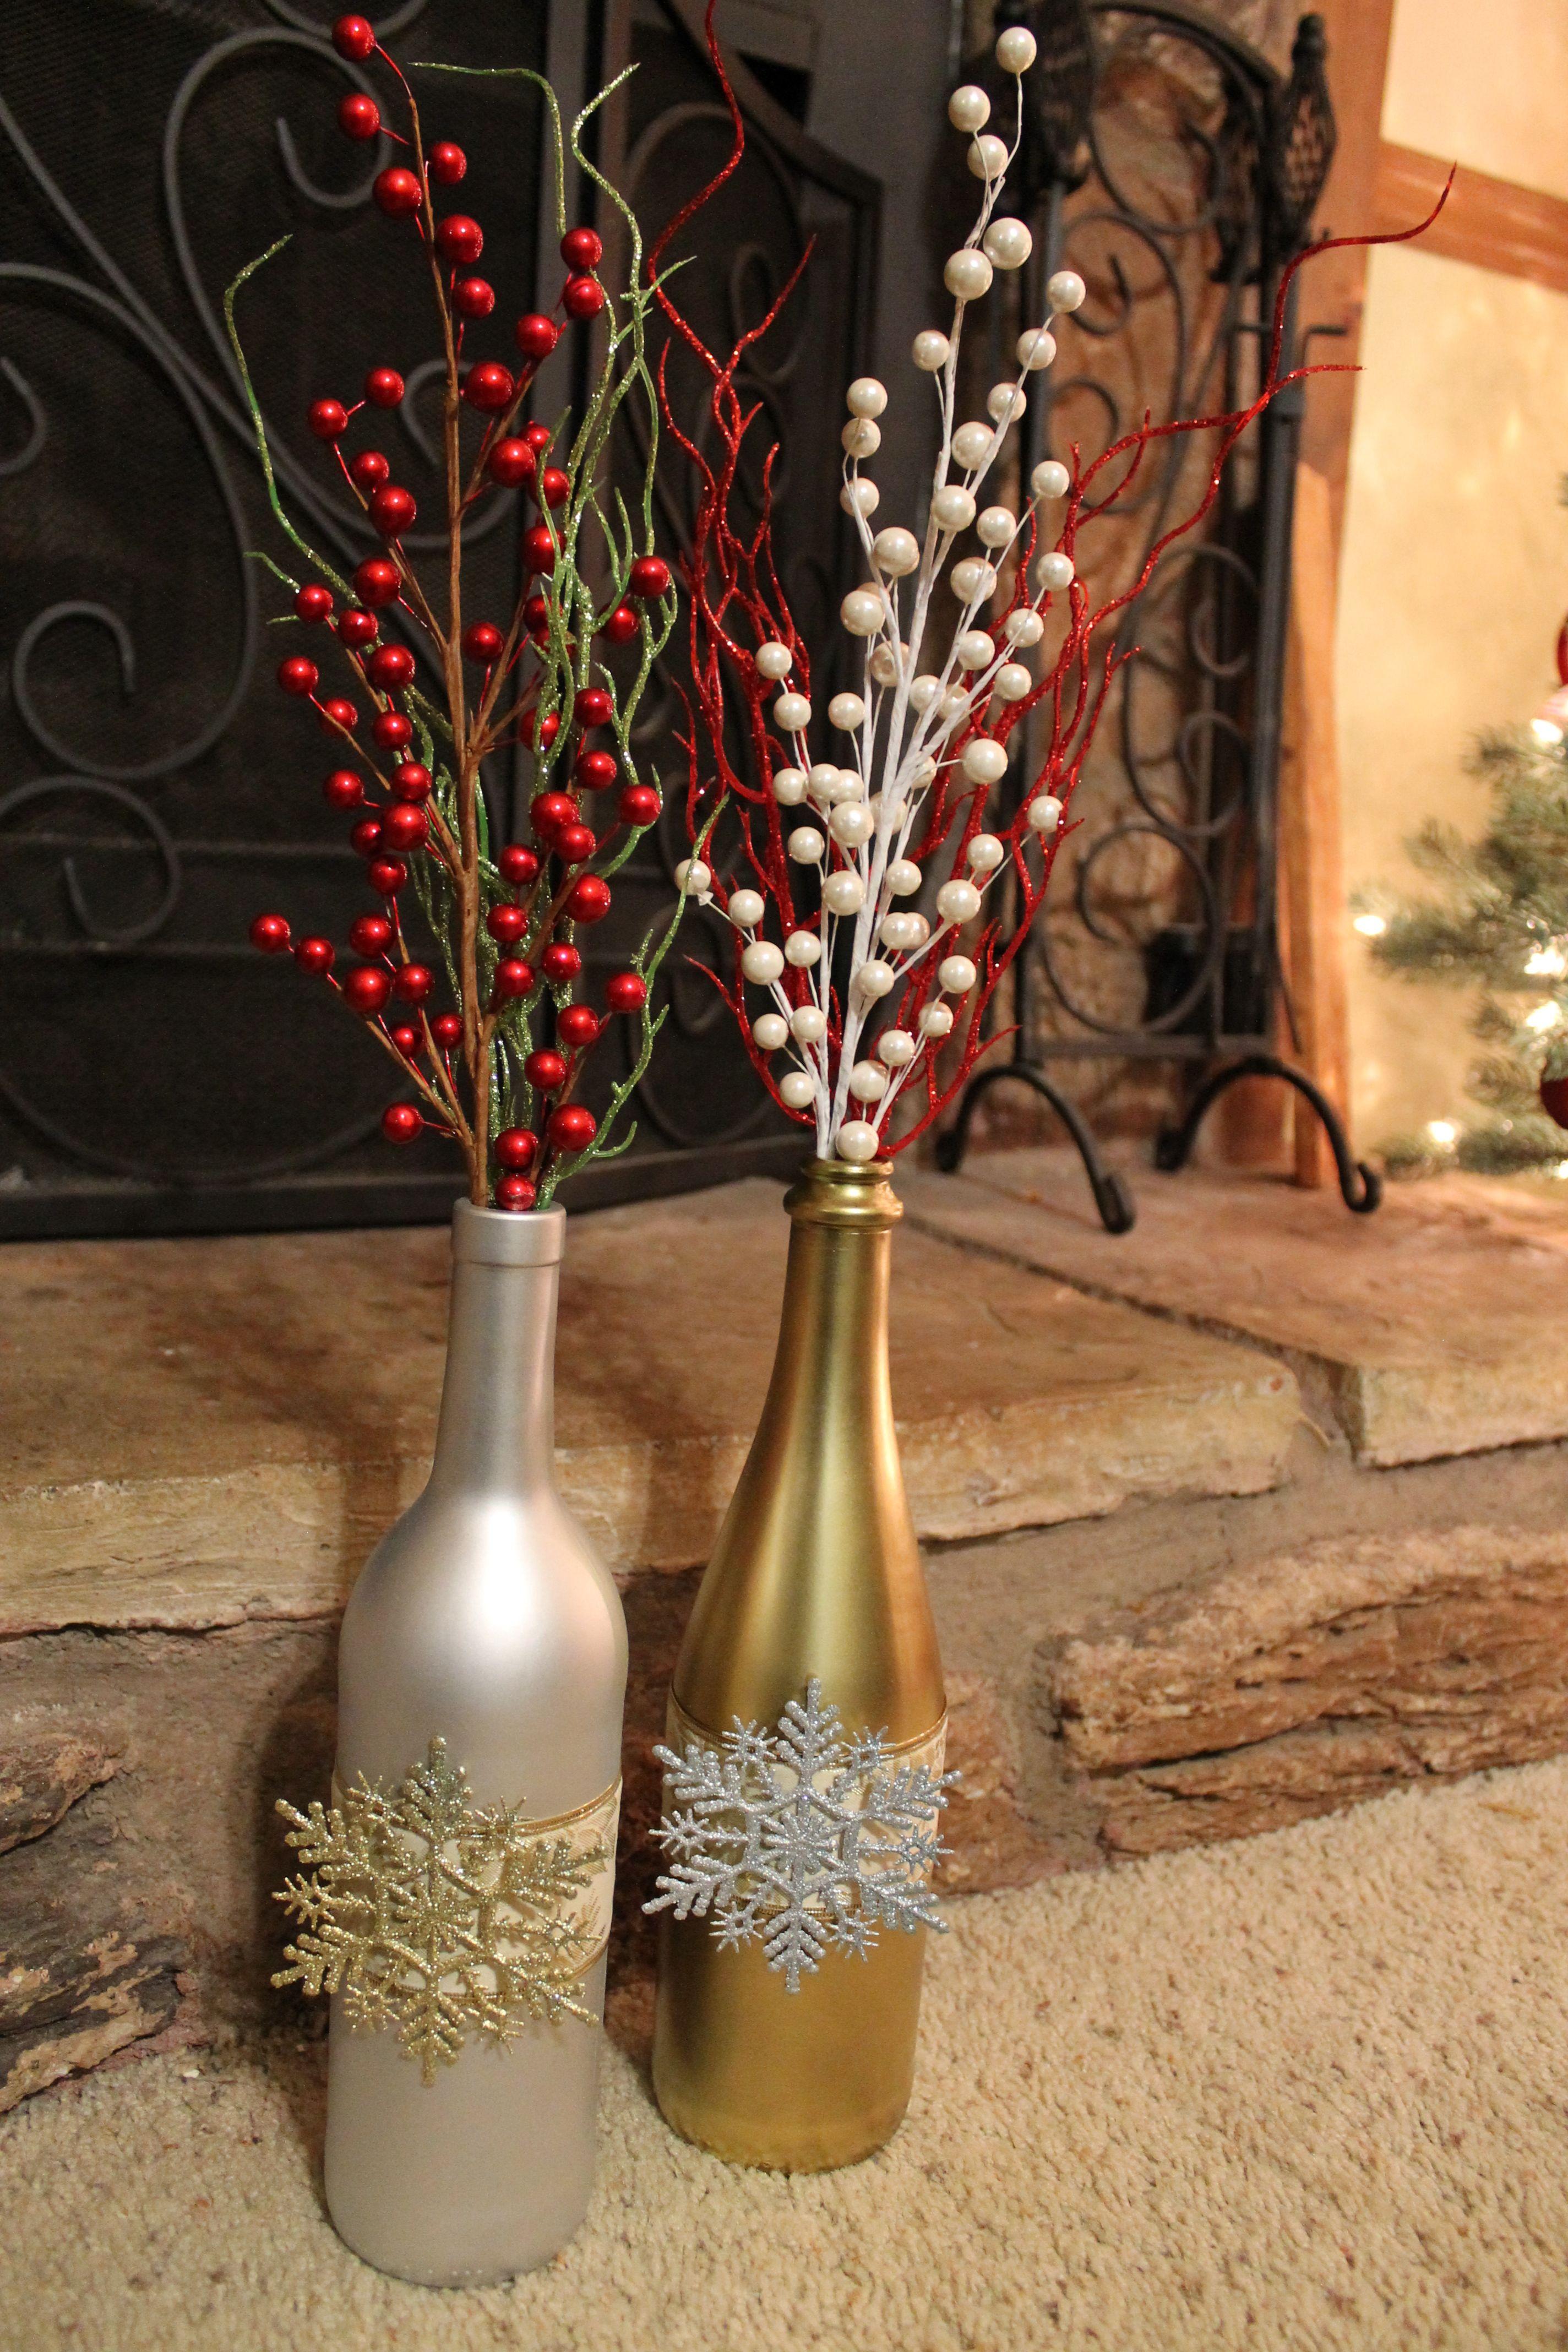 Christmas decor recycled wine bottles she 39 s crafty for Recycled christmas decorations using bottles